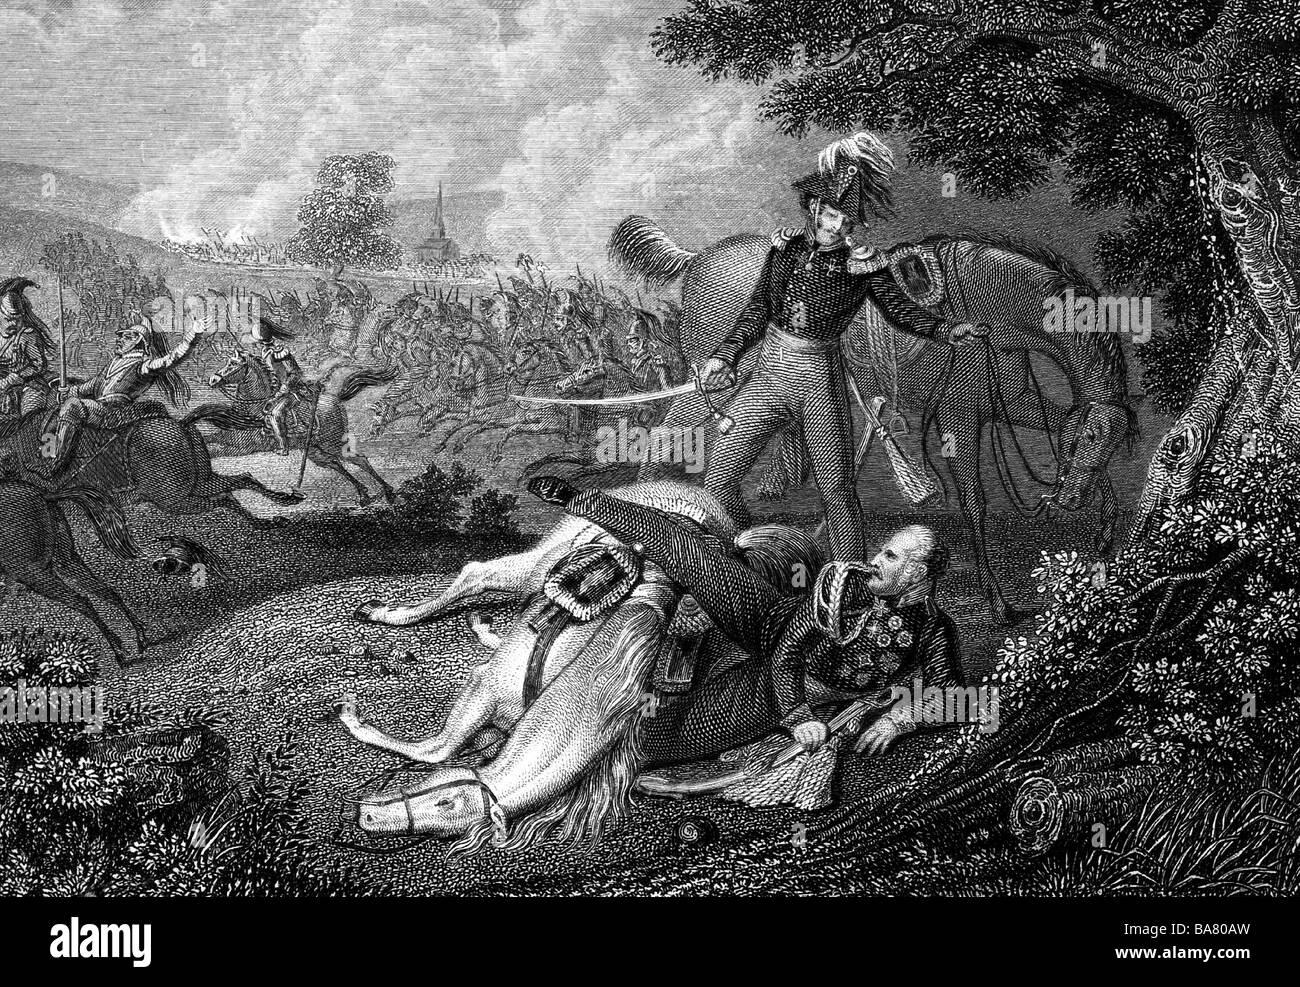 Blücher, Gebhard Leberecht von, 16.12.1742 -  12.9.1819, Prussian general, full length, dropped in battle near - Stock Image